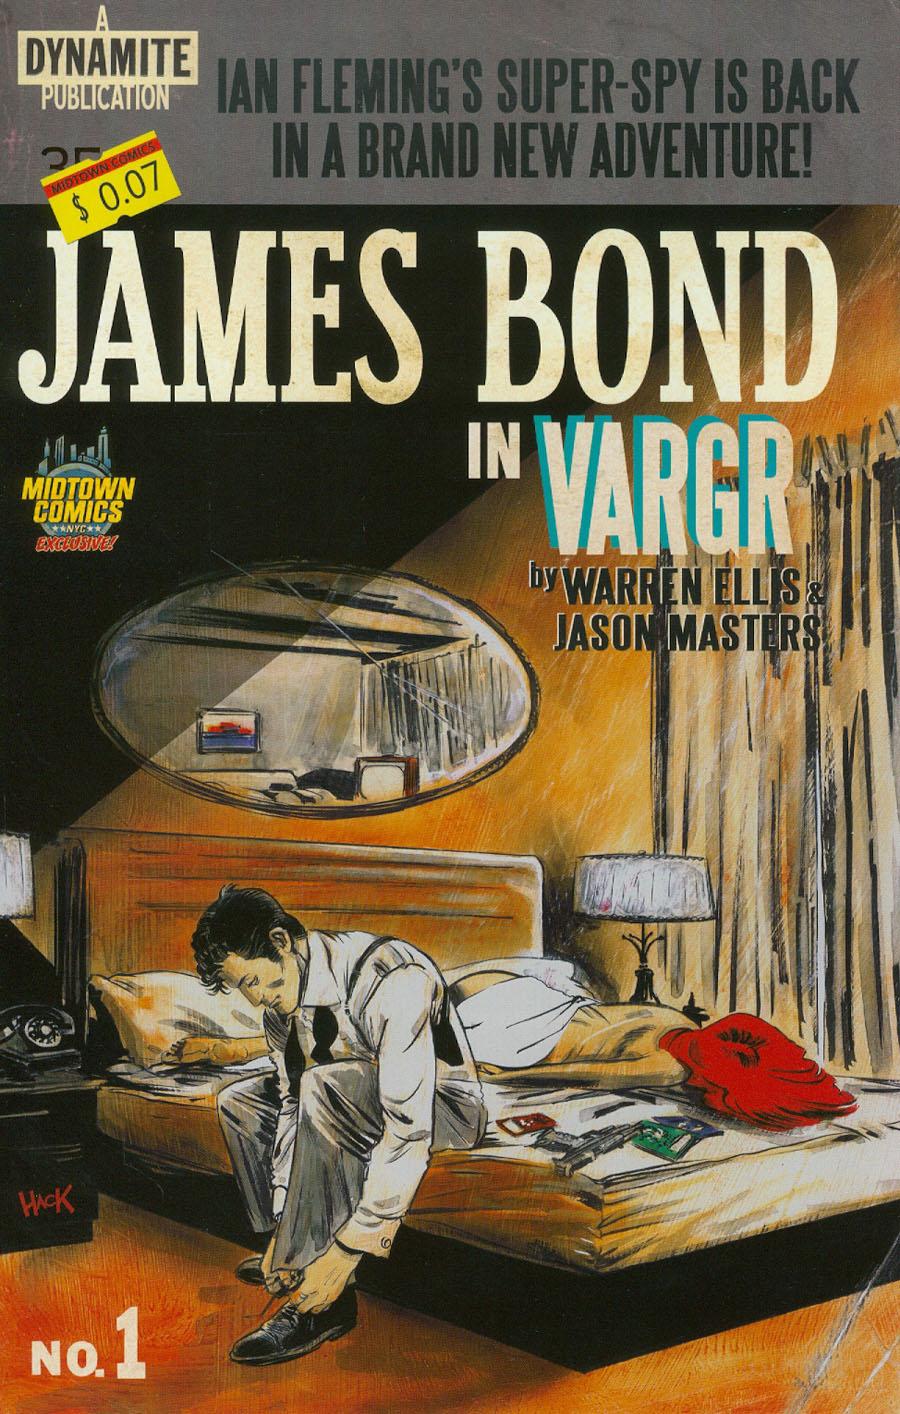 James Bond #1 Cover I Midtown Exclusive Robert Hack Retro Novel Variant Cover